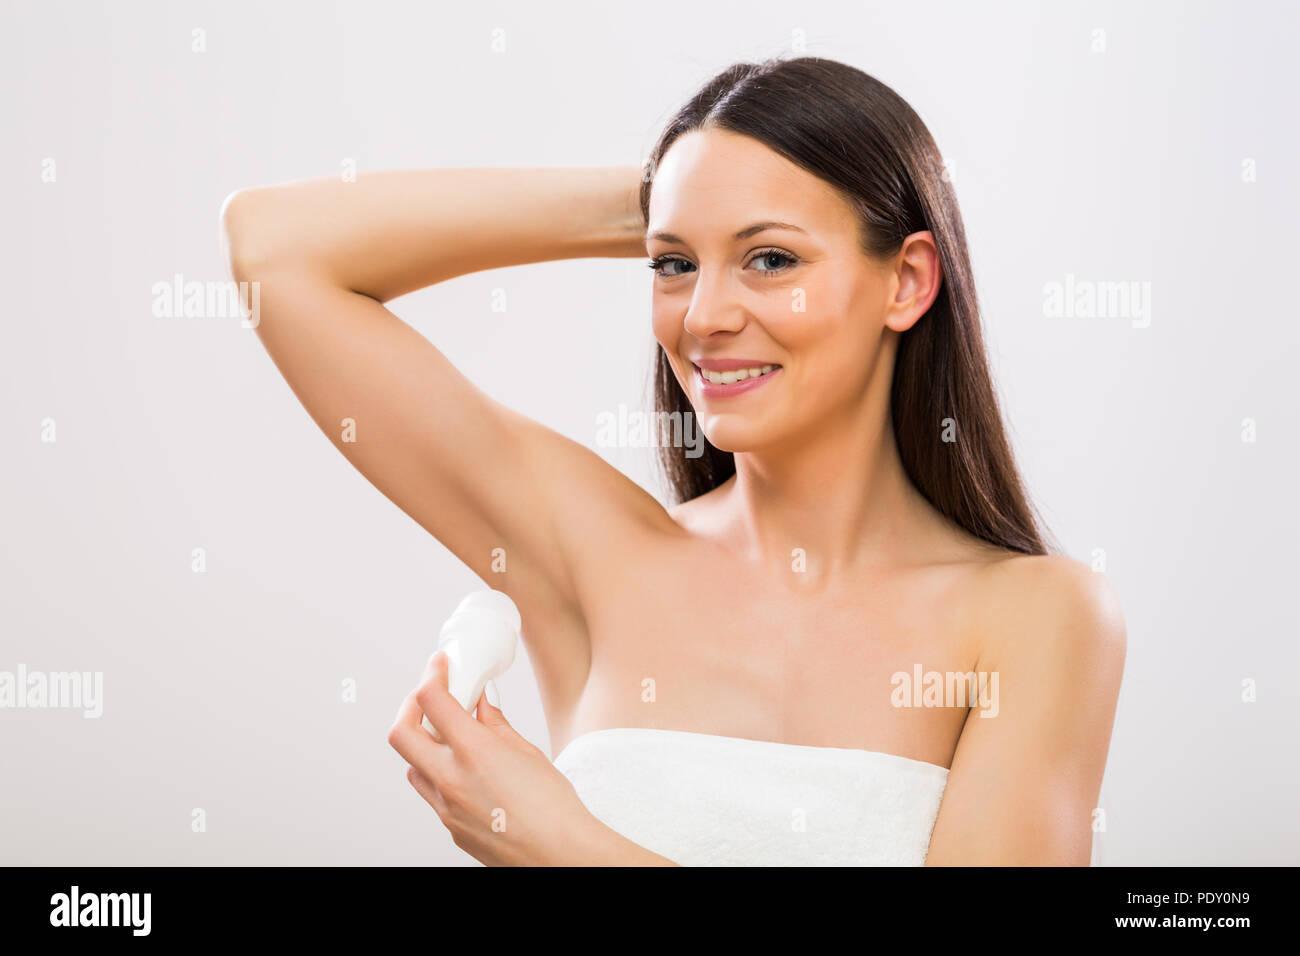 Beautiful woman using antiperspirant. - Stock Image